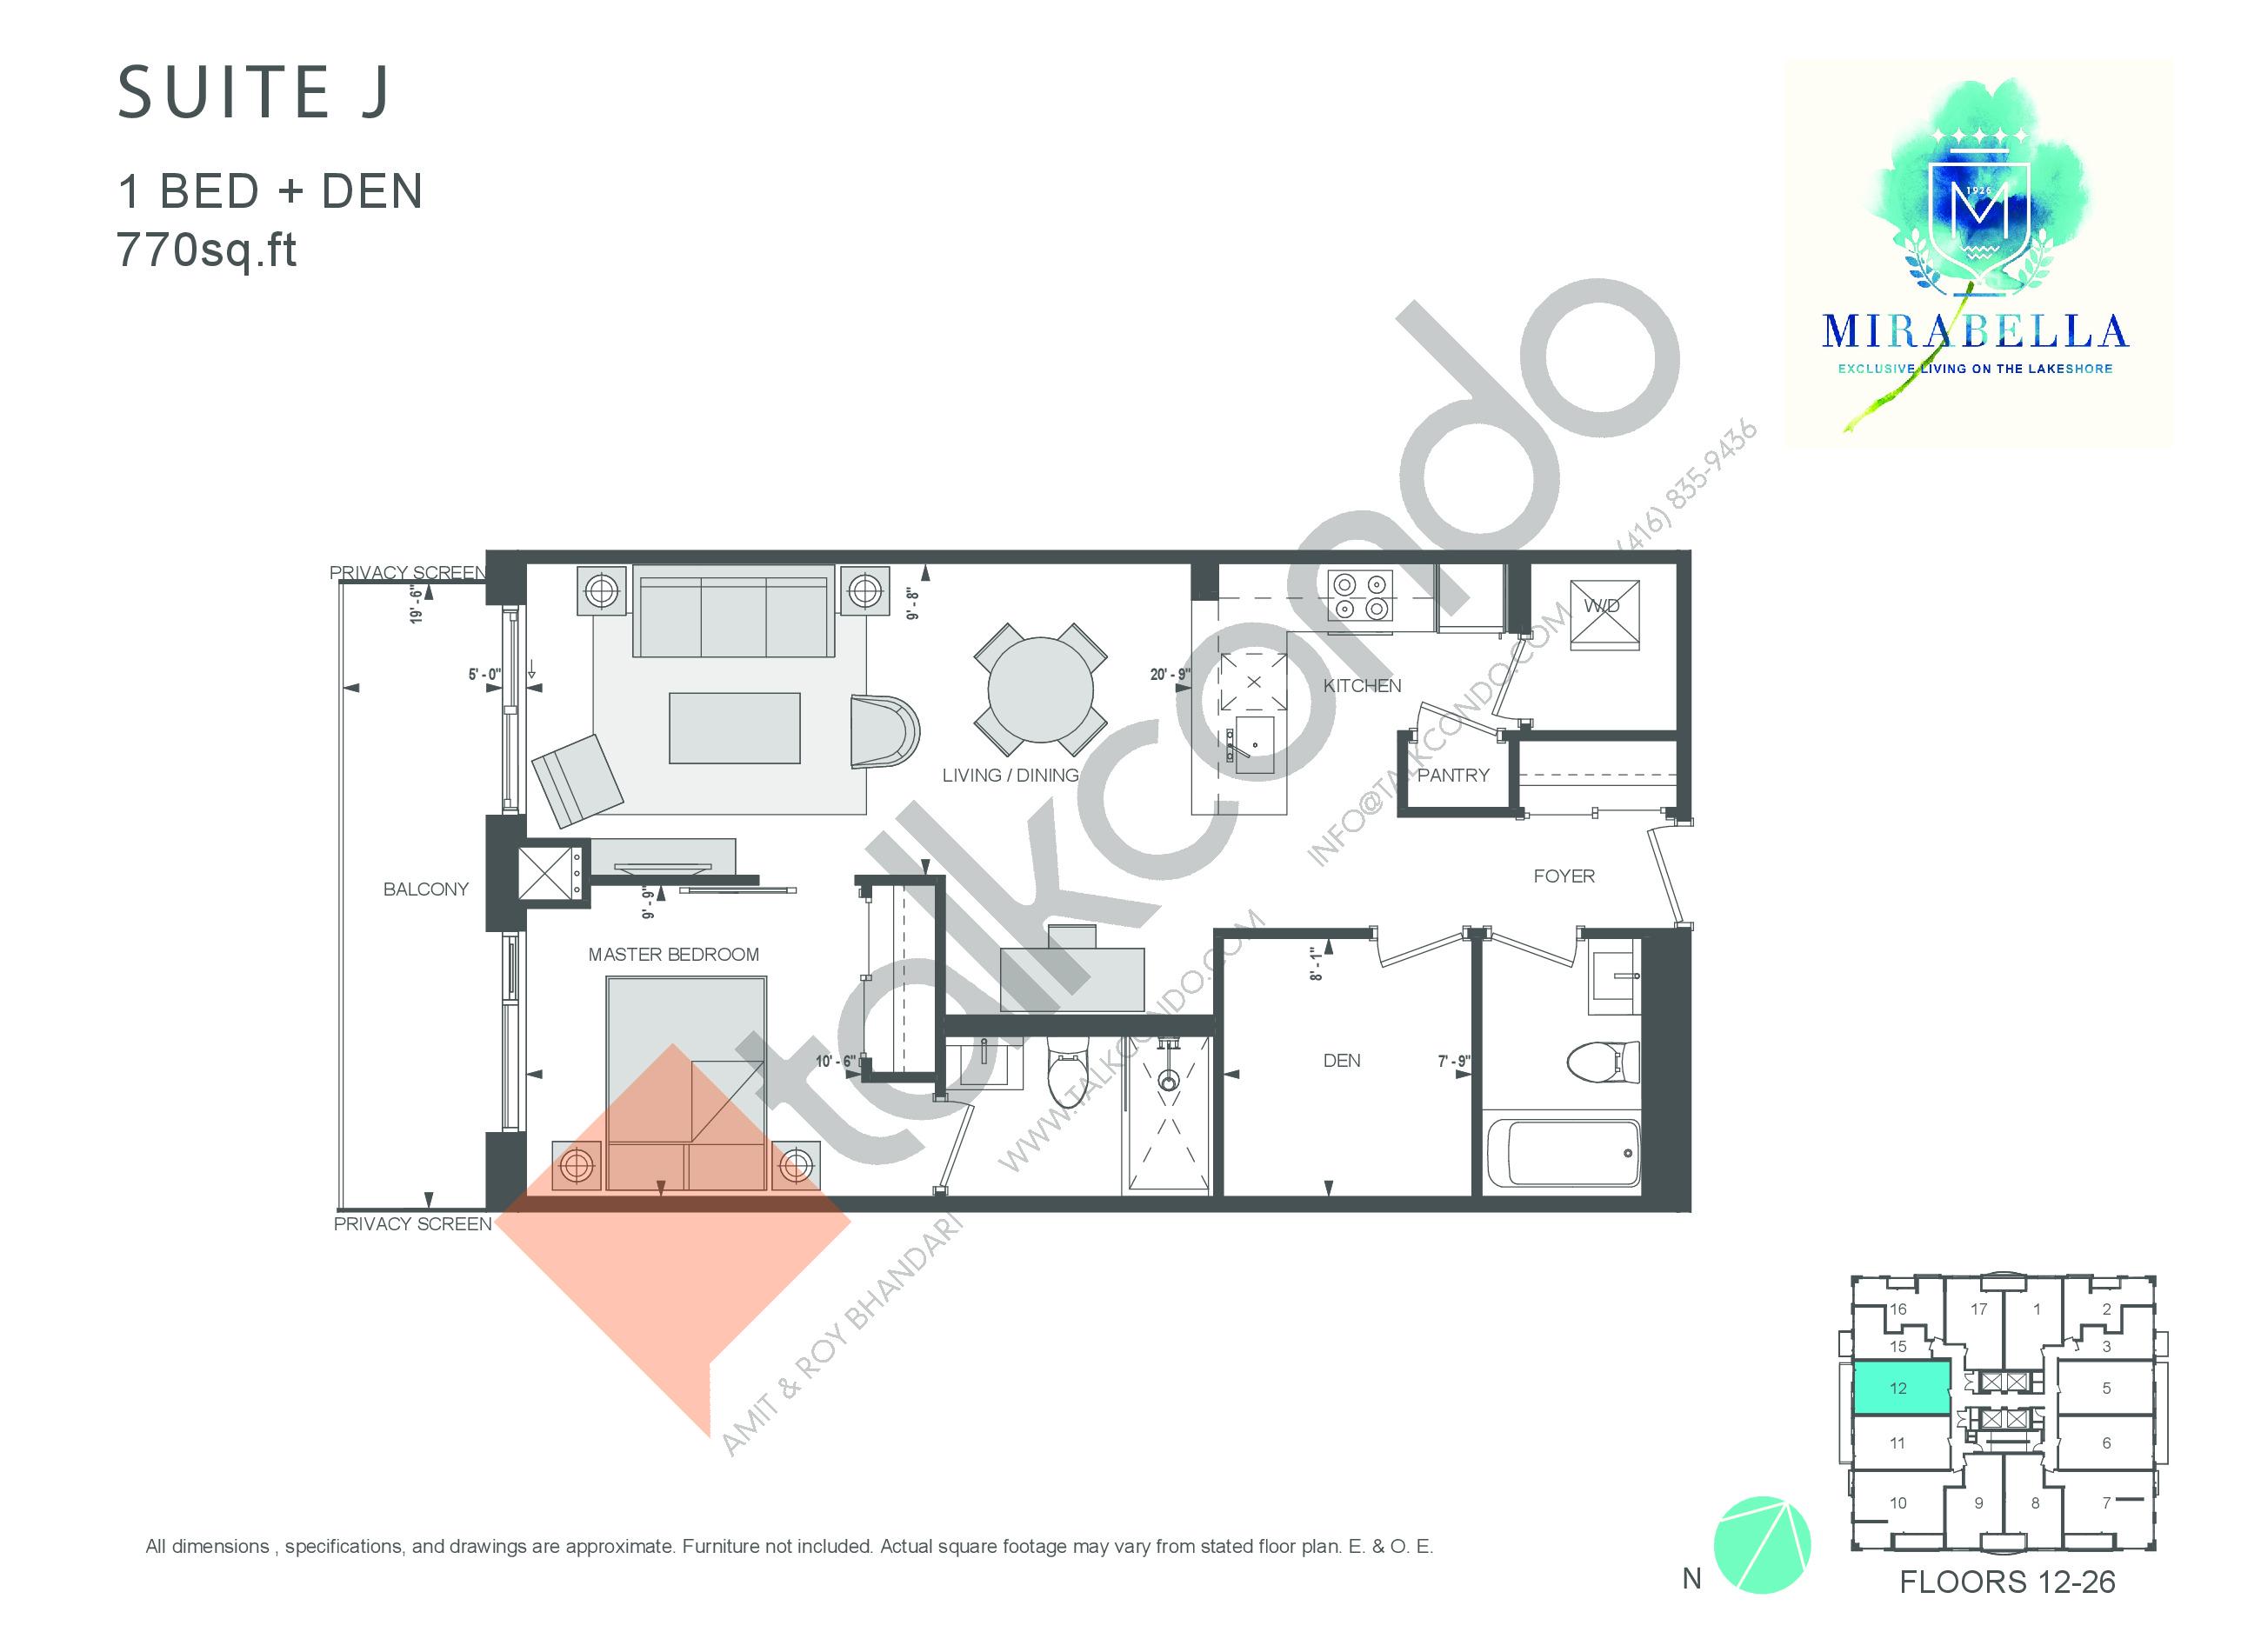 Suite J Floor Plan at Mirabella Luxury Condos East Tower - 770 sq.ft